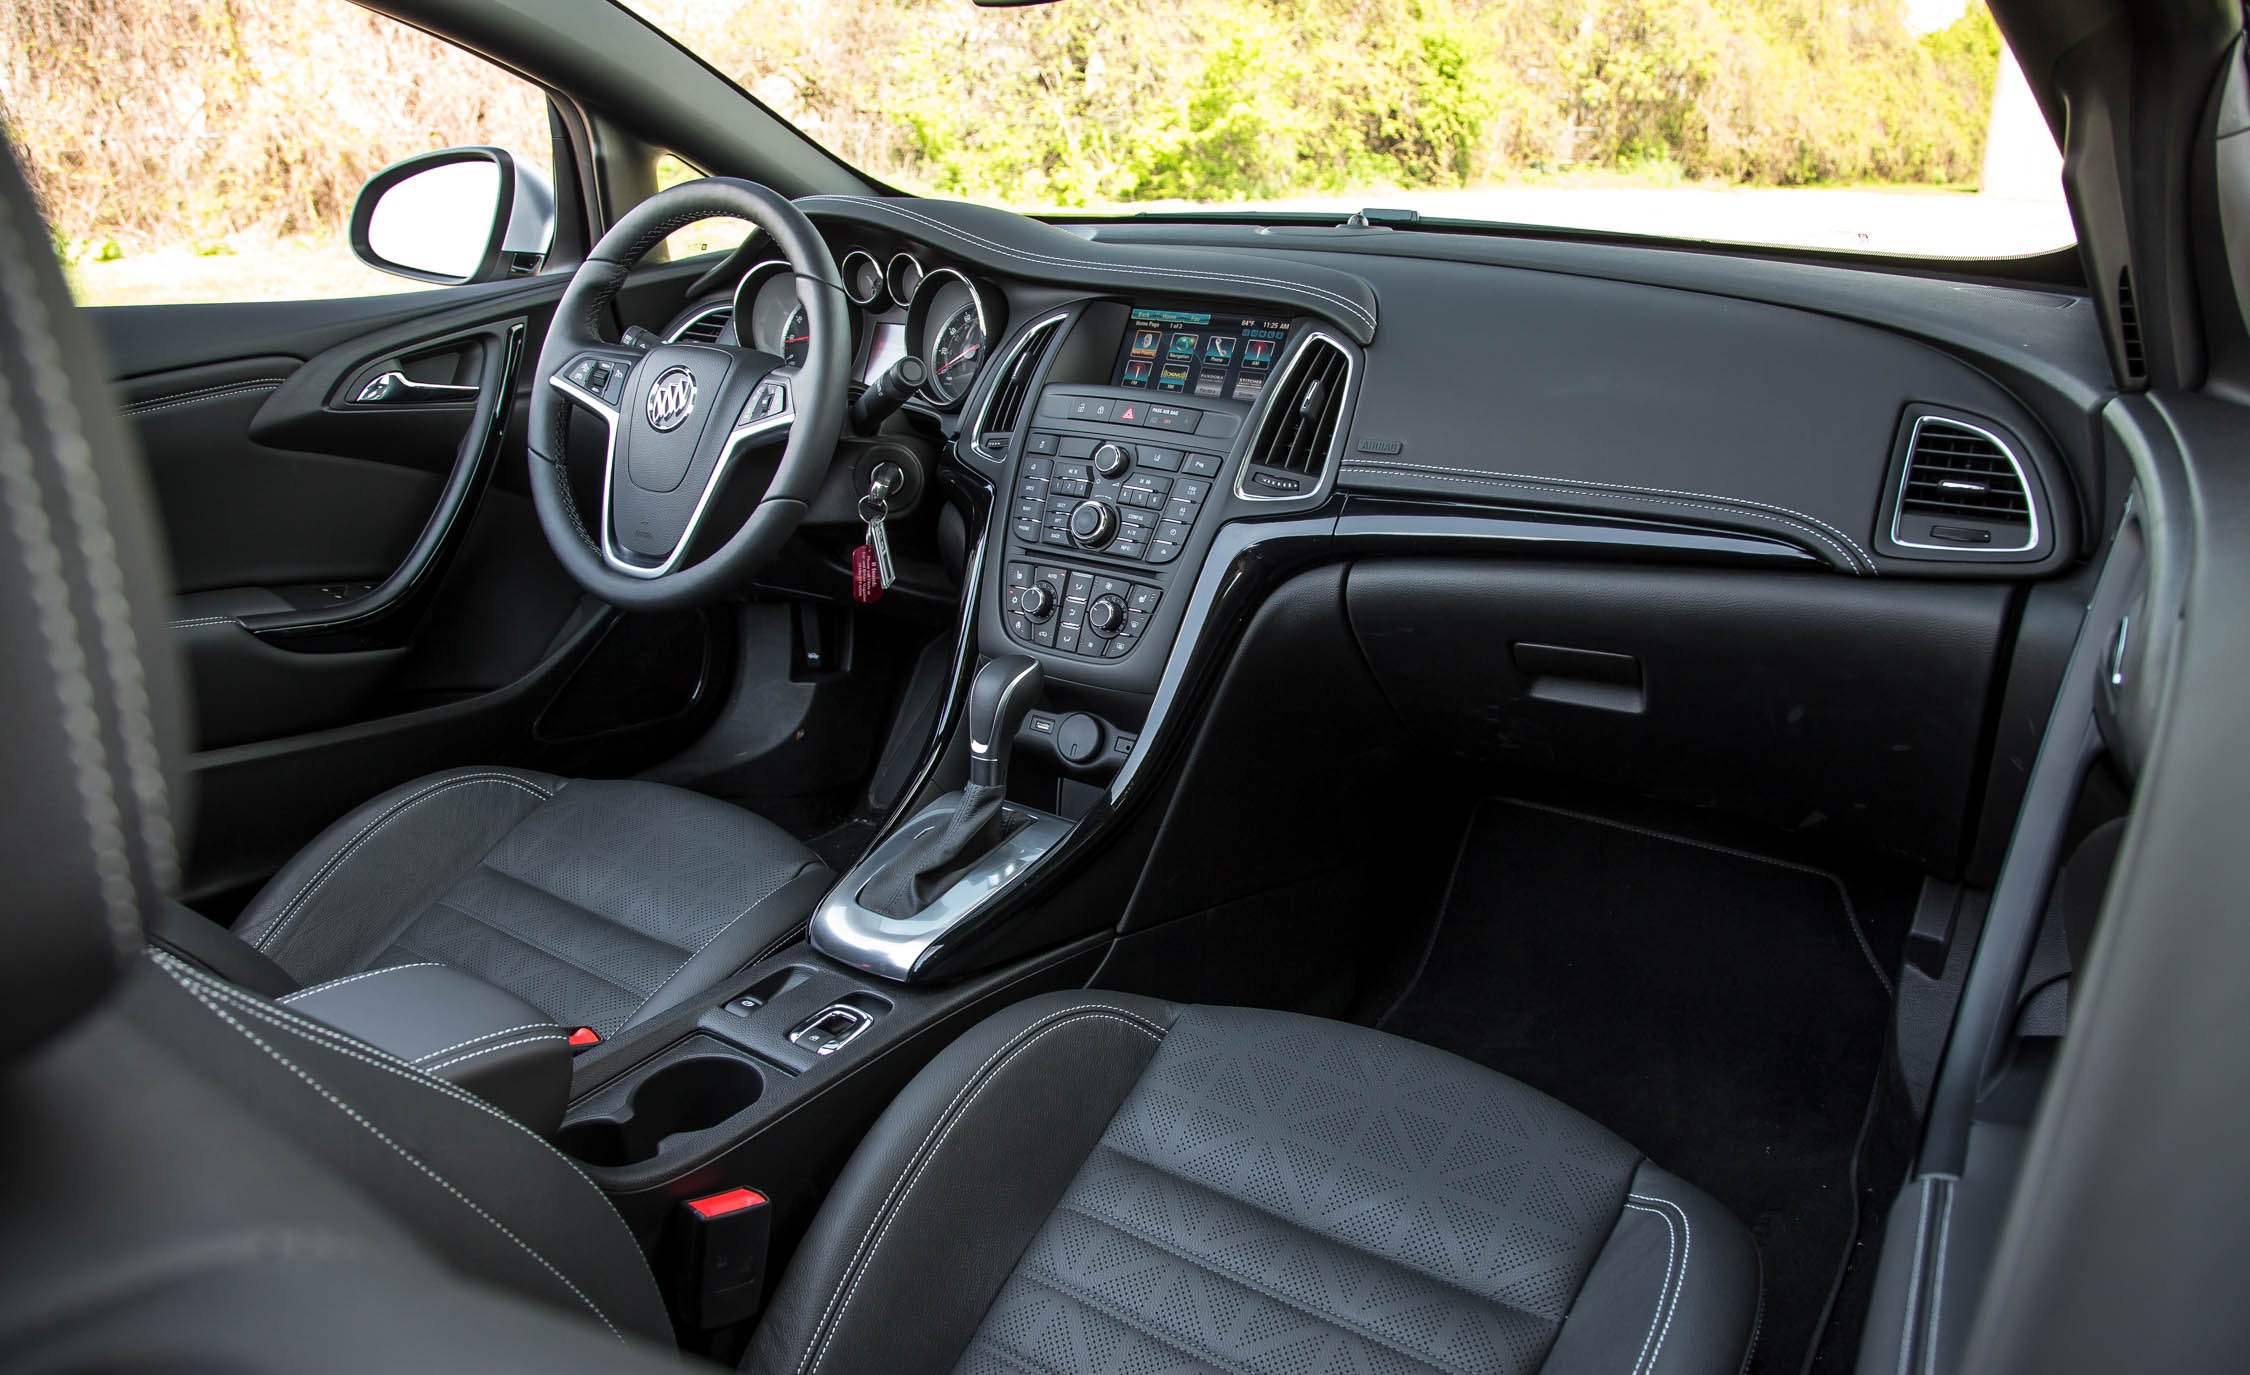 2016 Buick Cascada Premium (View 6 of 24)